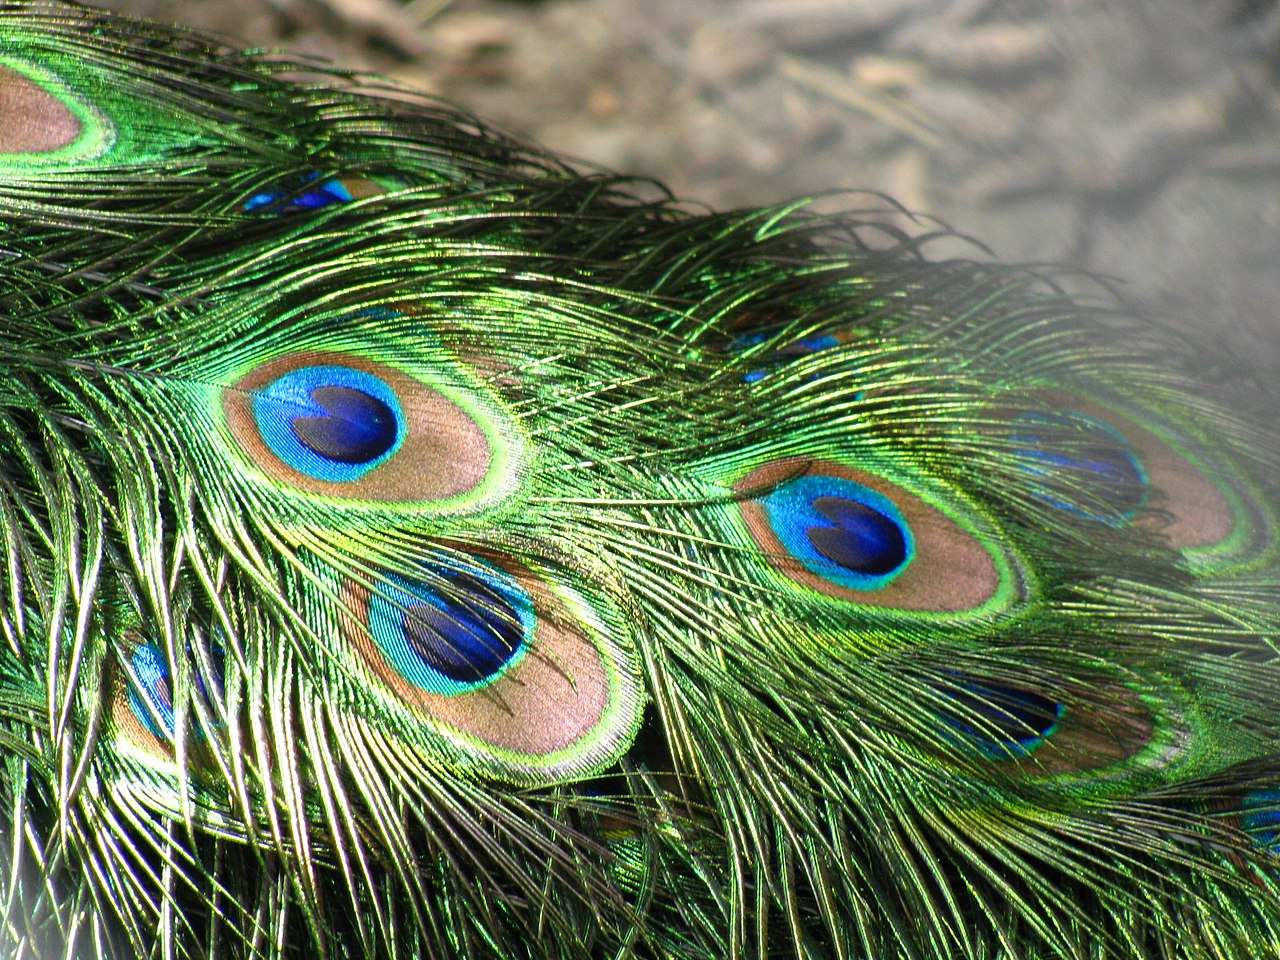 File:Peacock feathers closeup.jpg - Wikipedia